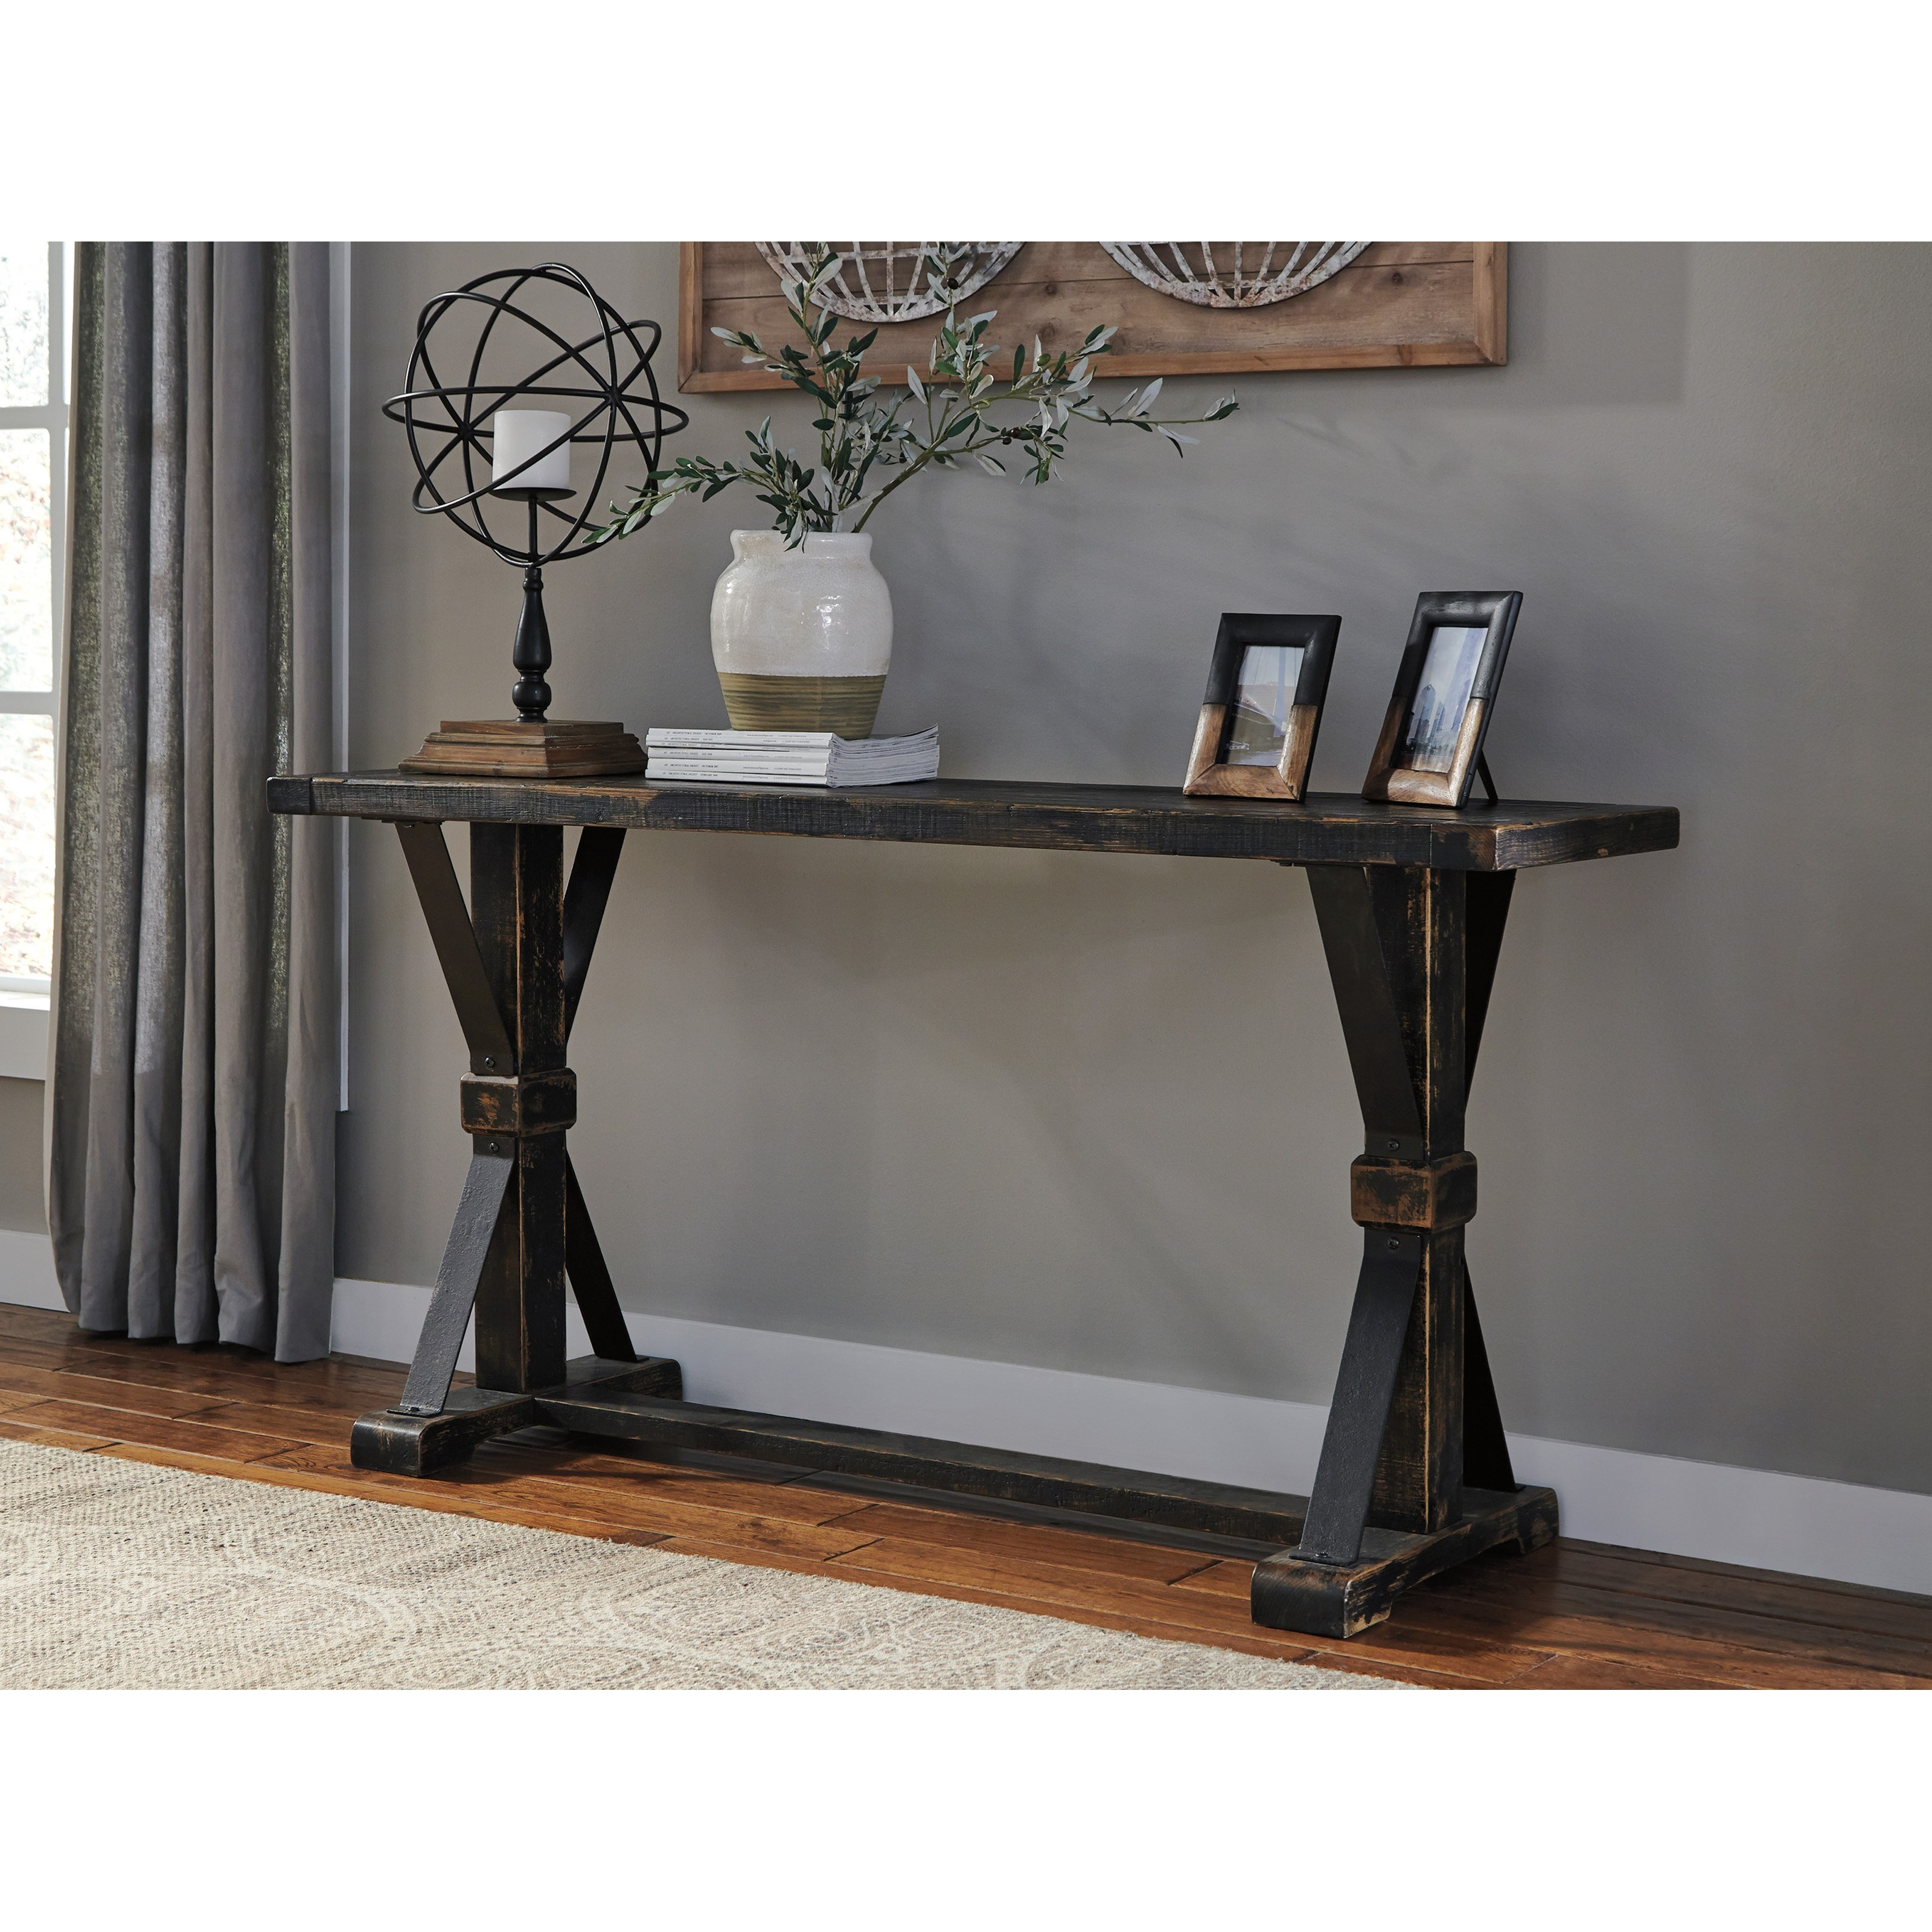 Ashley Signature Design Beckendorf Rustic Farmhouse Style Sofa Table Dunk &